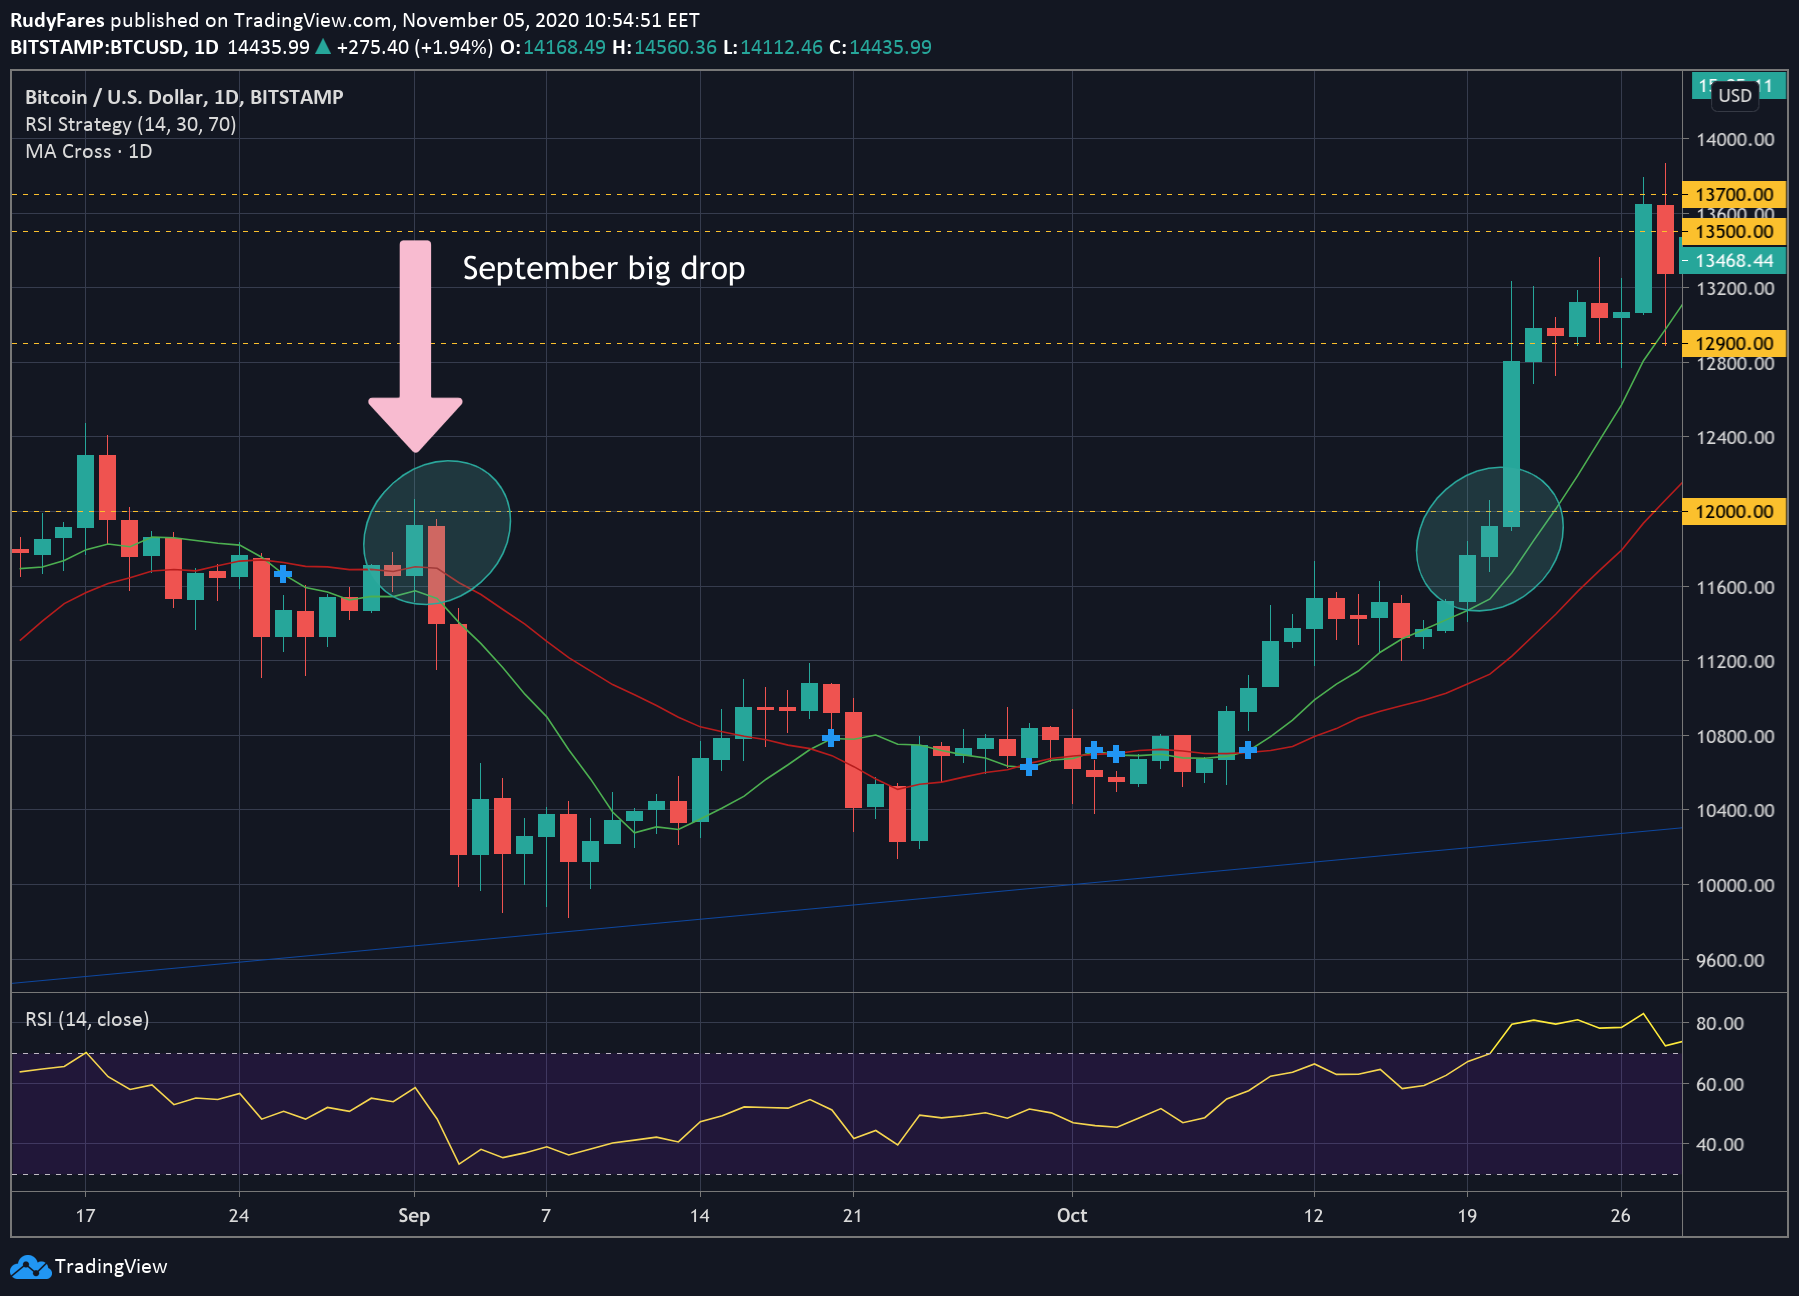 BTC/USD price 1D chart, 45 days price recovery